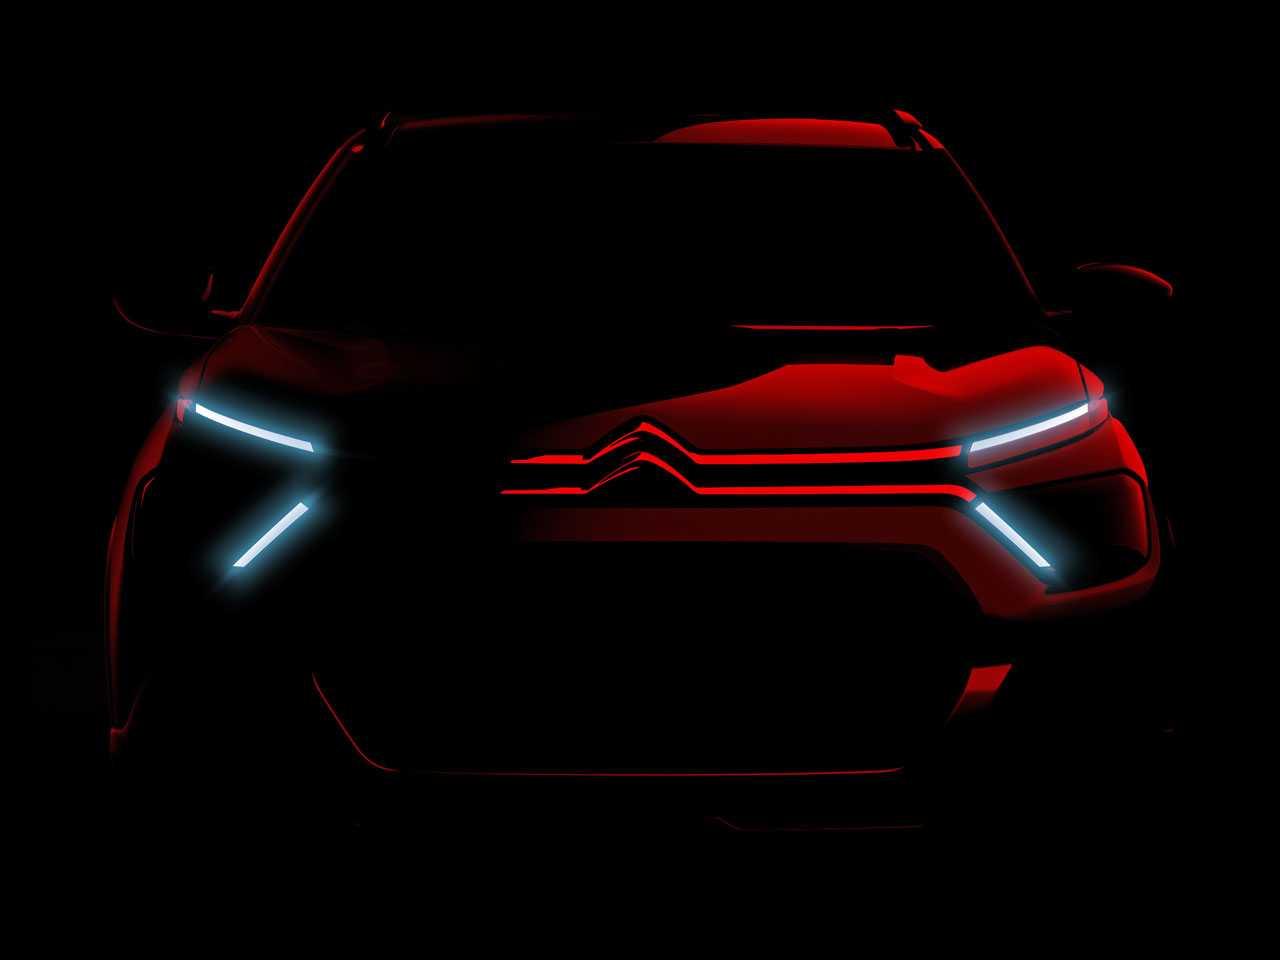 O teaser do novo Citroën C3 2022